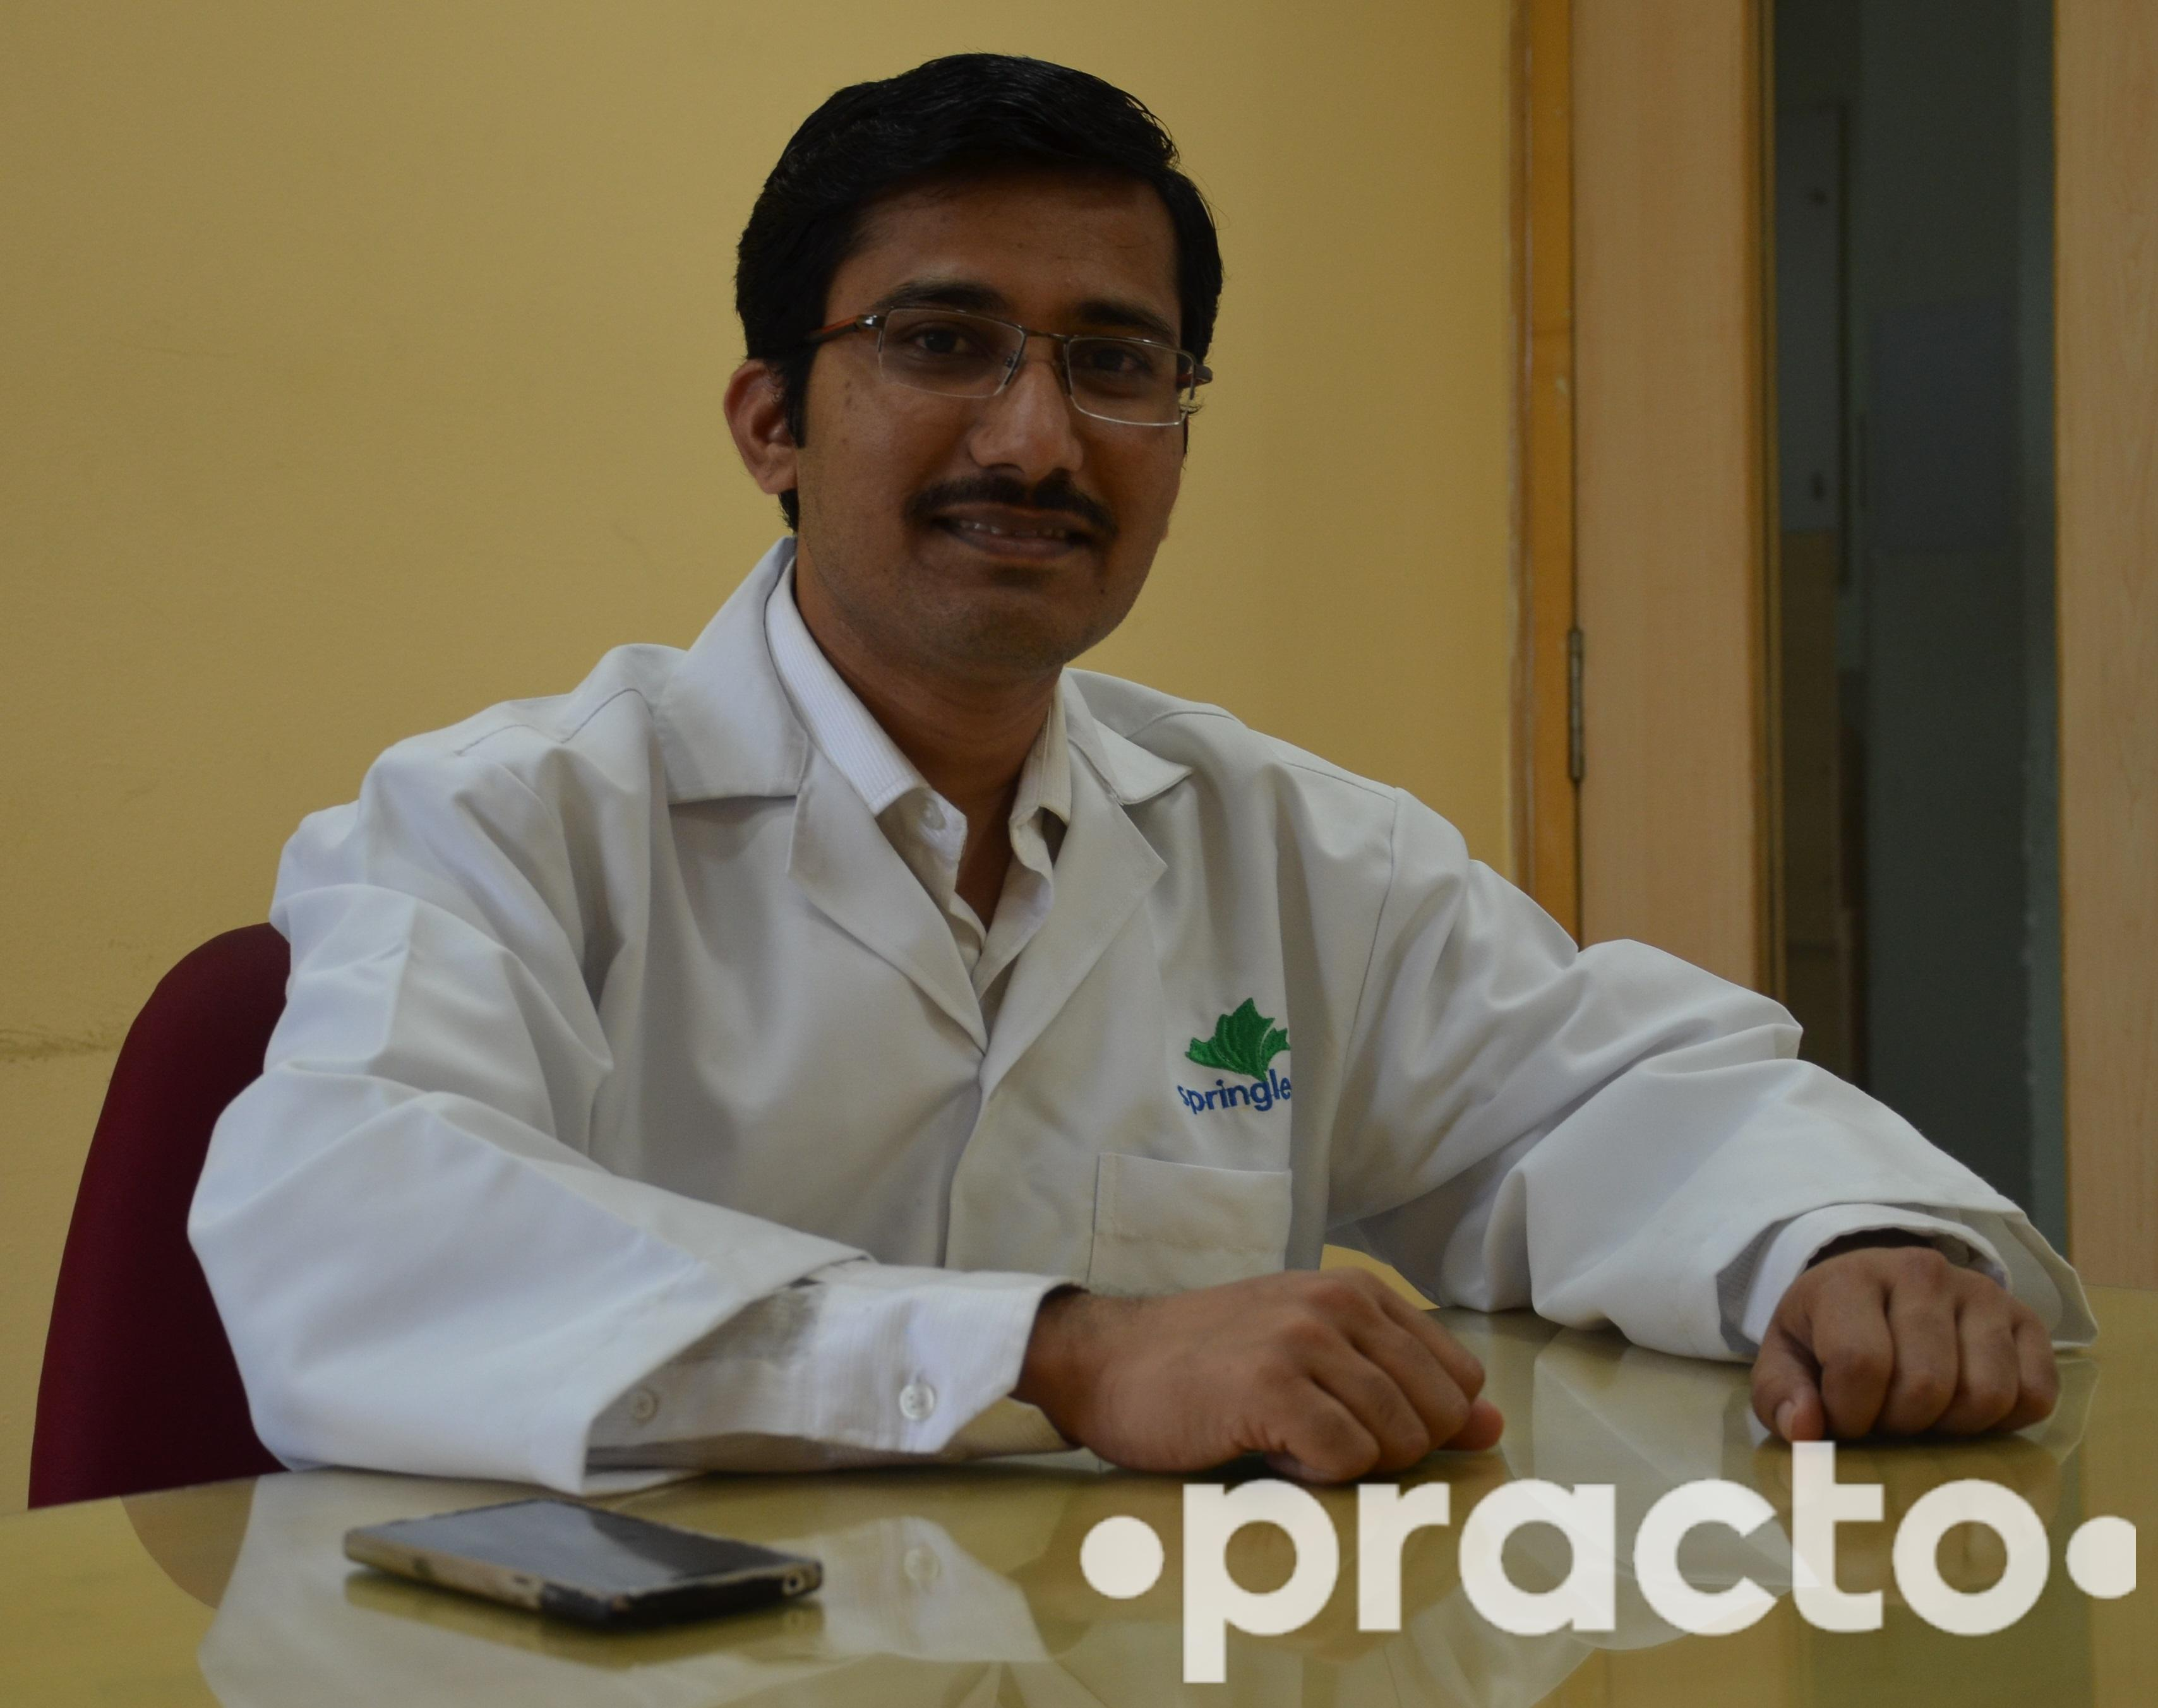 Dr. Vithal Malmande - General Surgeon